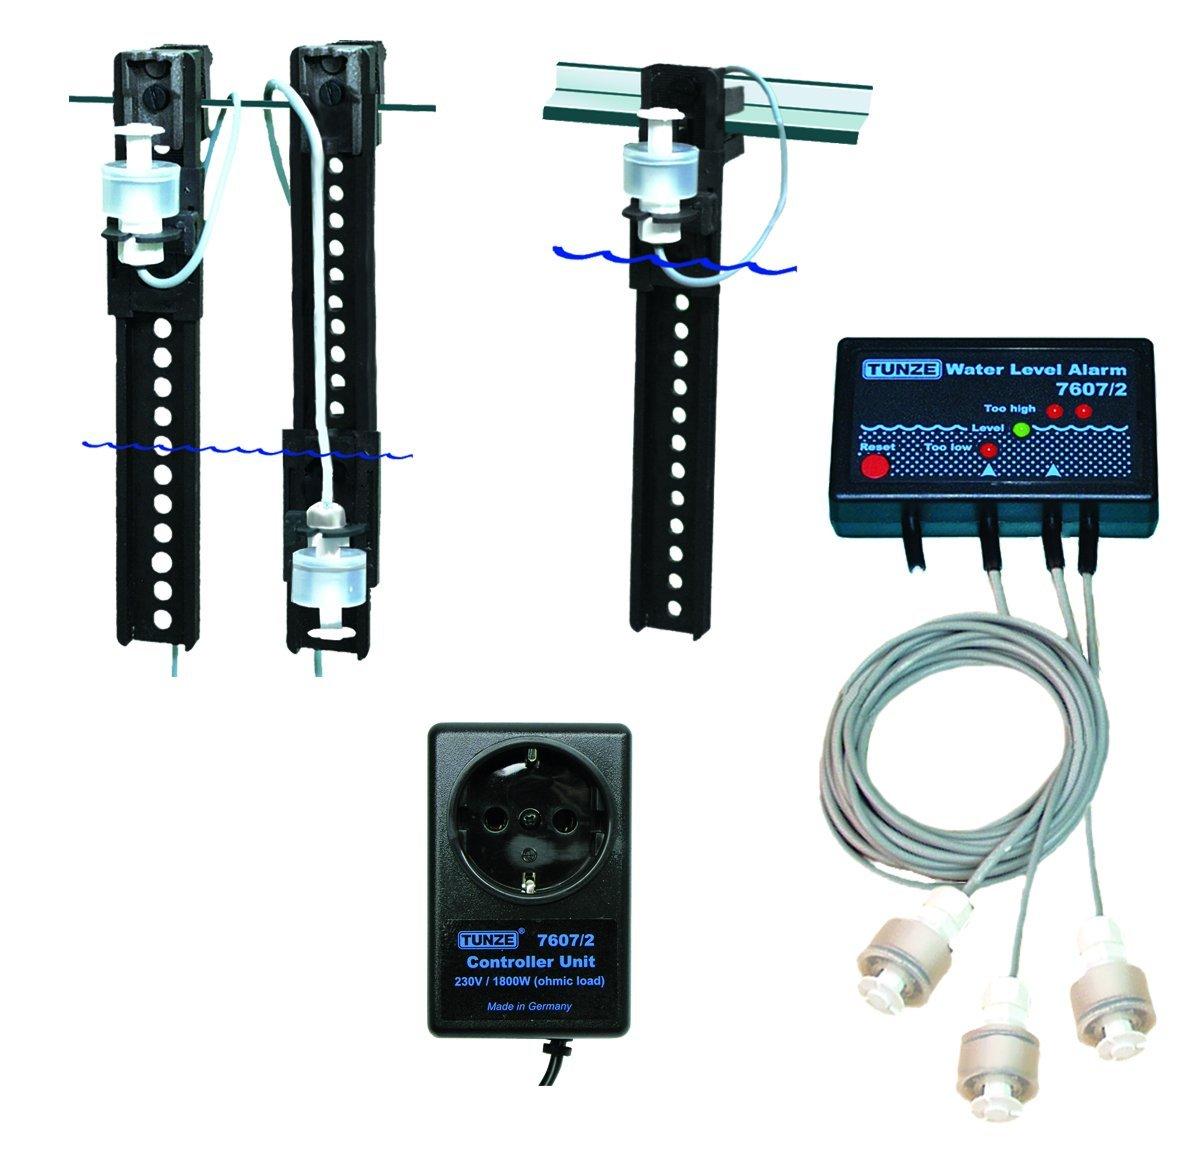 Tunze USA 7607/2 Water Level Alarm with 3-Sensors by Tunze USA LLC